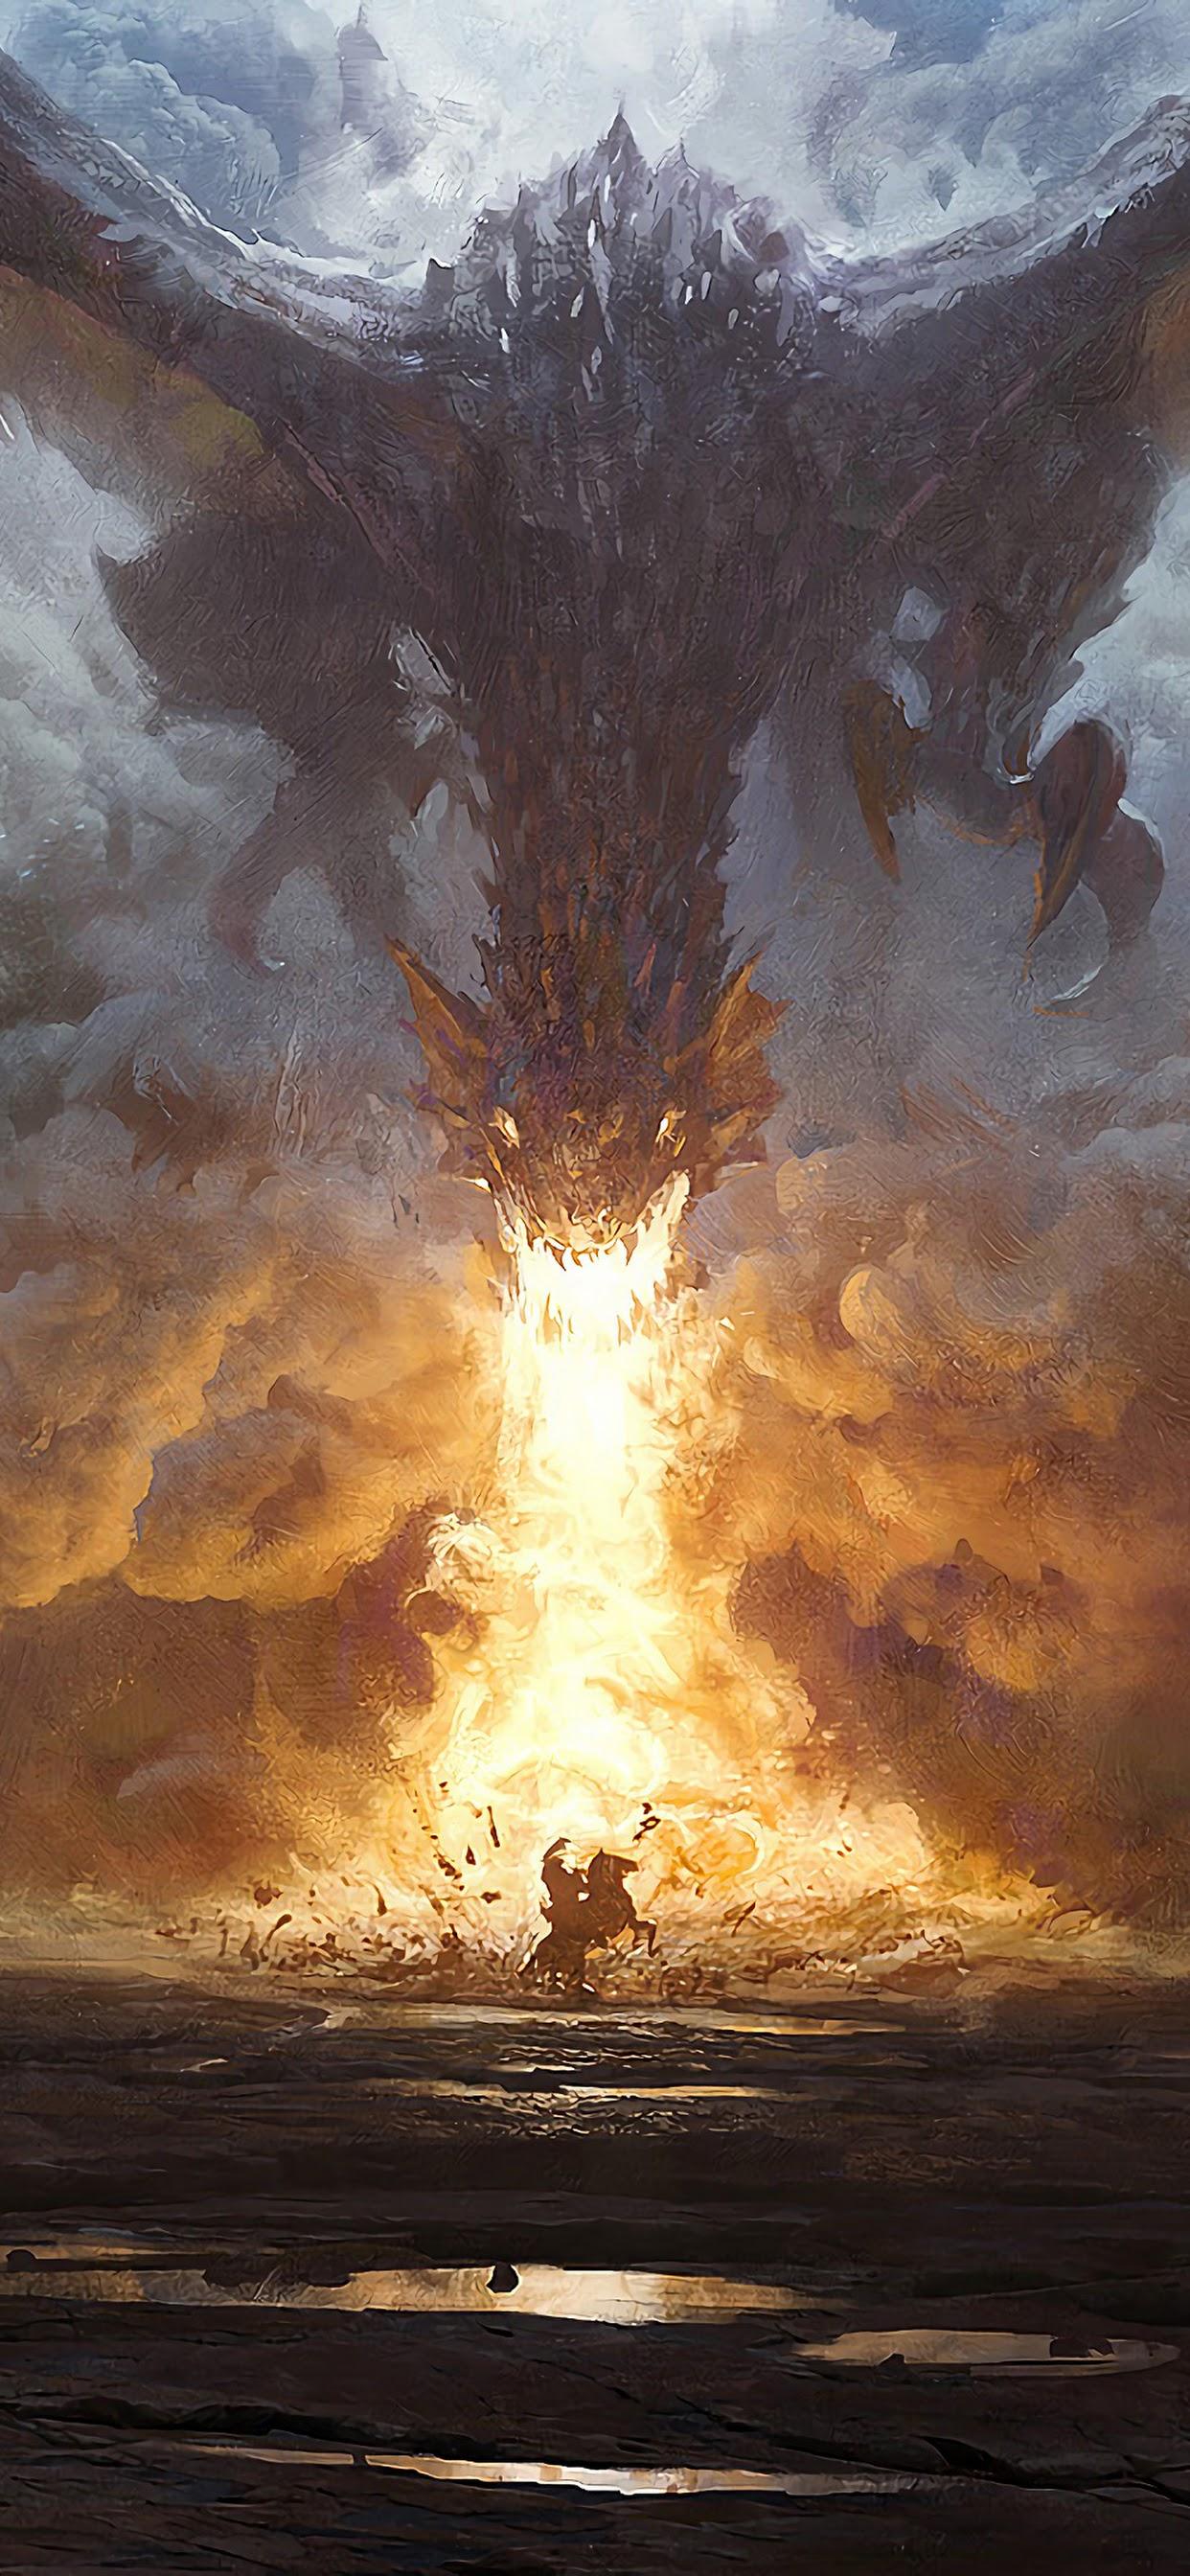 Dragon Fire Breath Fantasy Art 4k Wallpaper 78